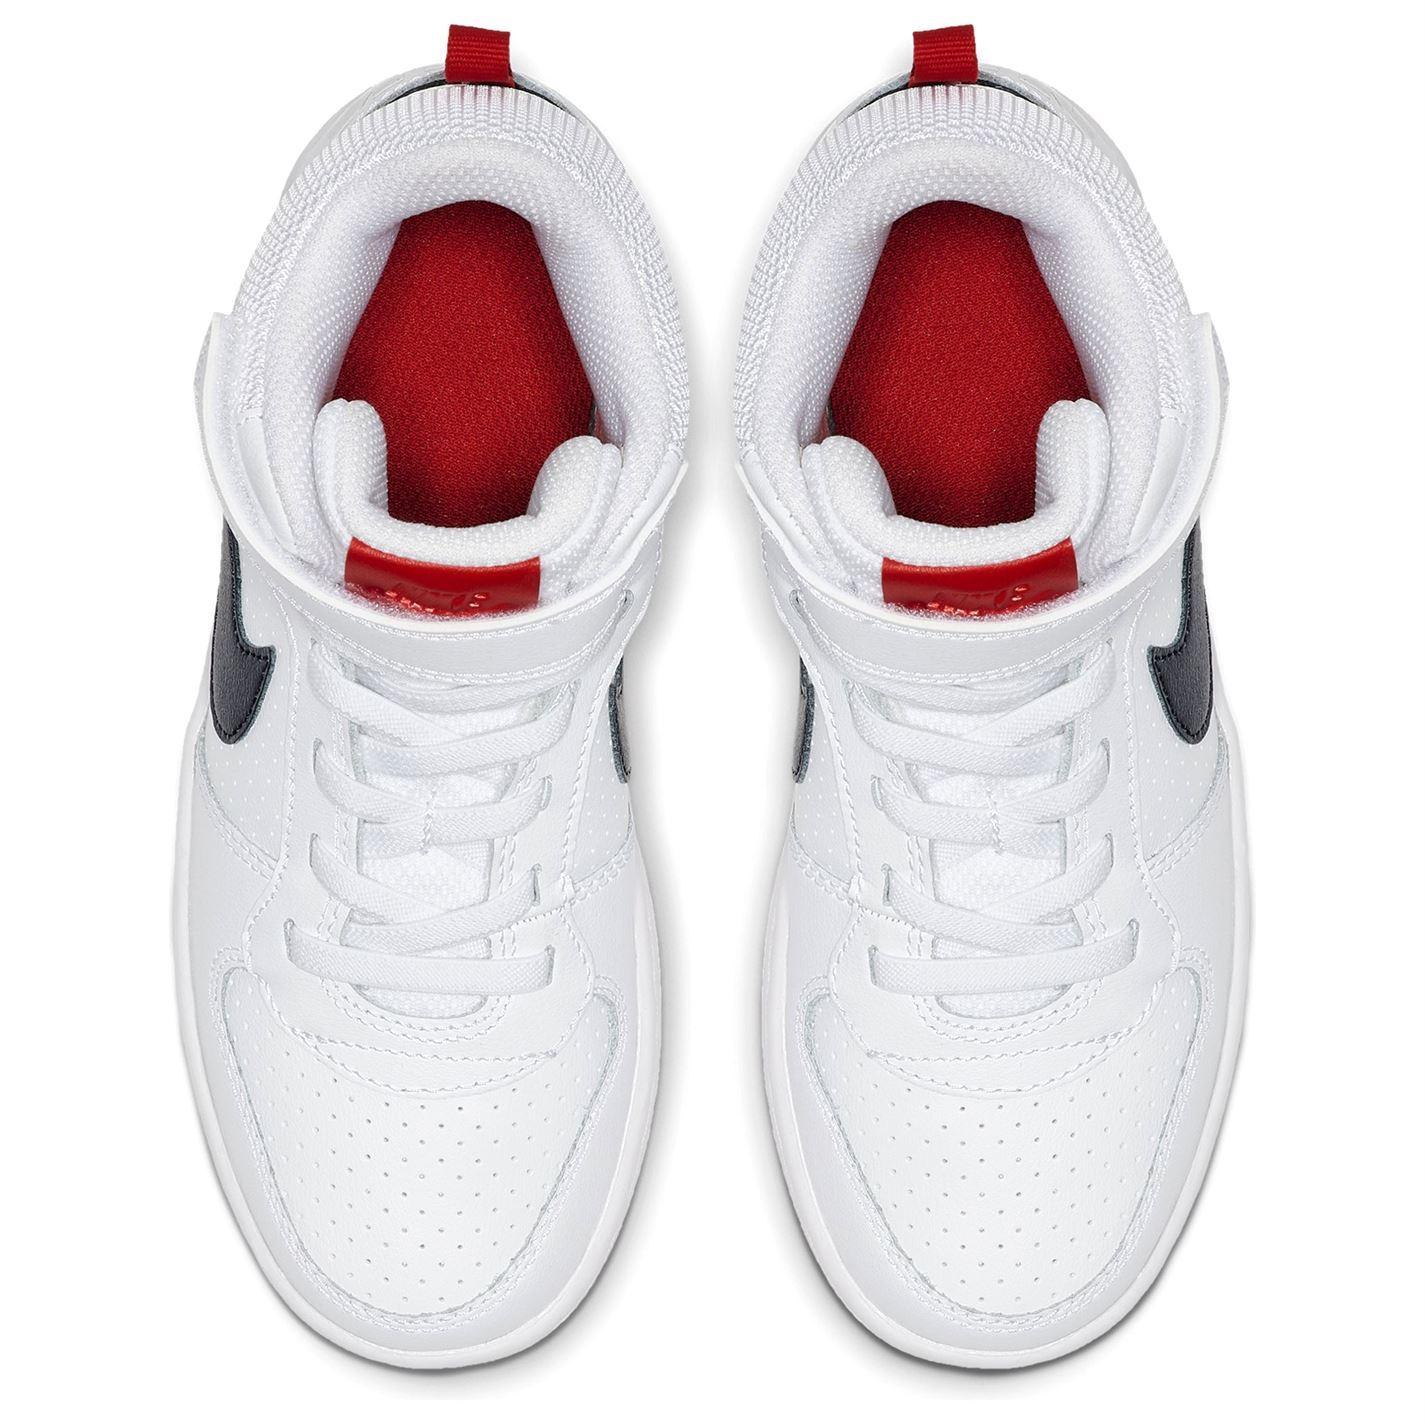 Scarpe da ginnastica Nike Court Borough Bambino Boys Scarpe Calzature